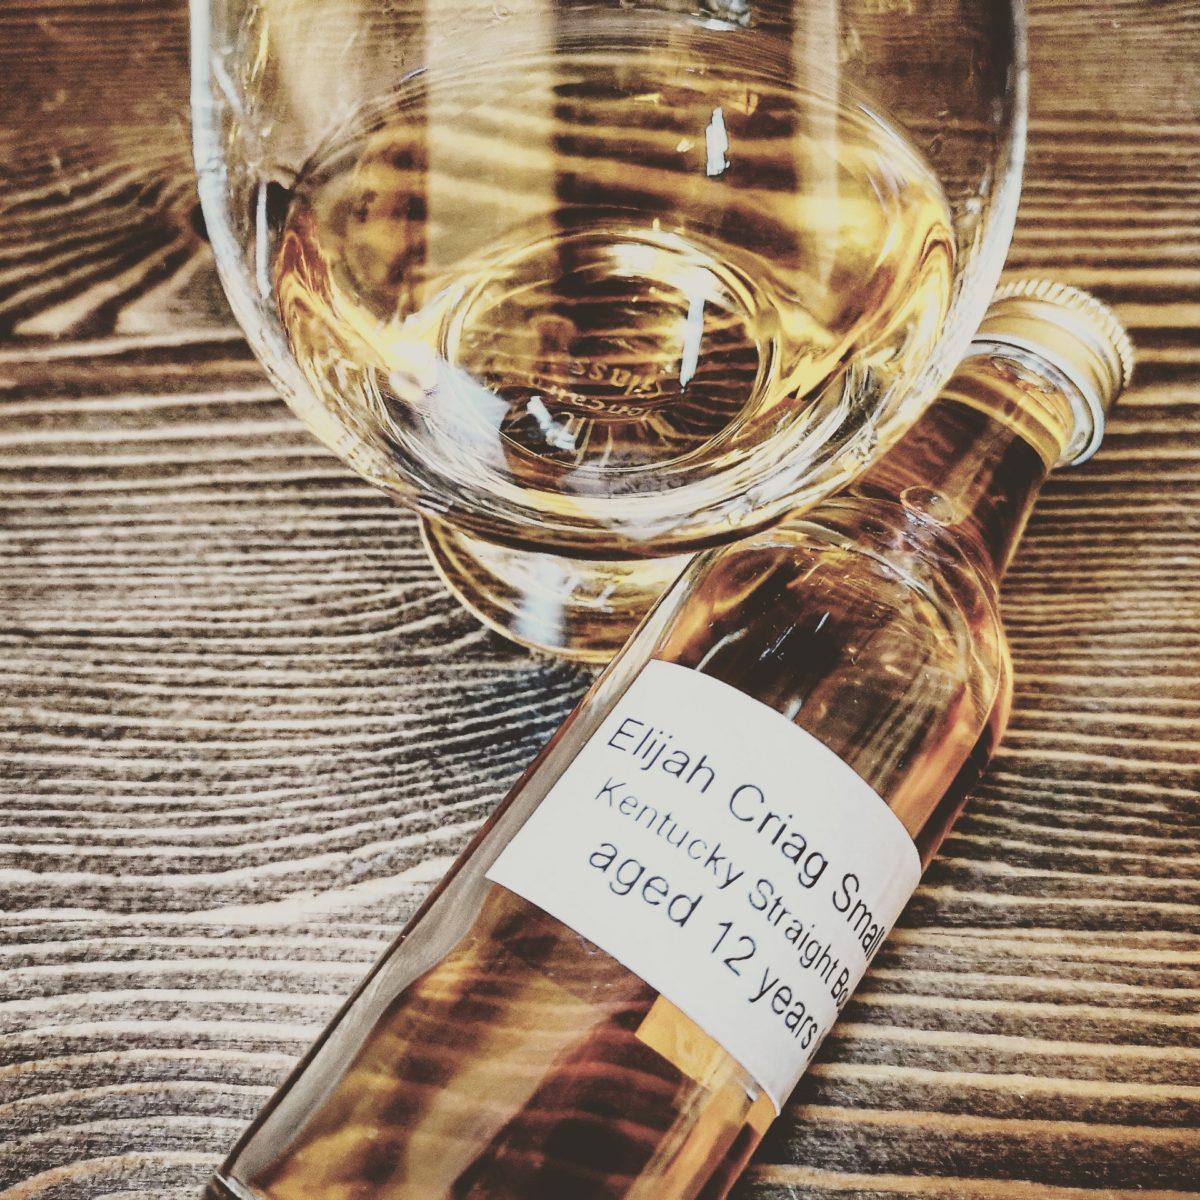 Elijah Craig 12 Jahre Small Batch Kentucky Straight Bourbon Whiskey